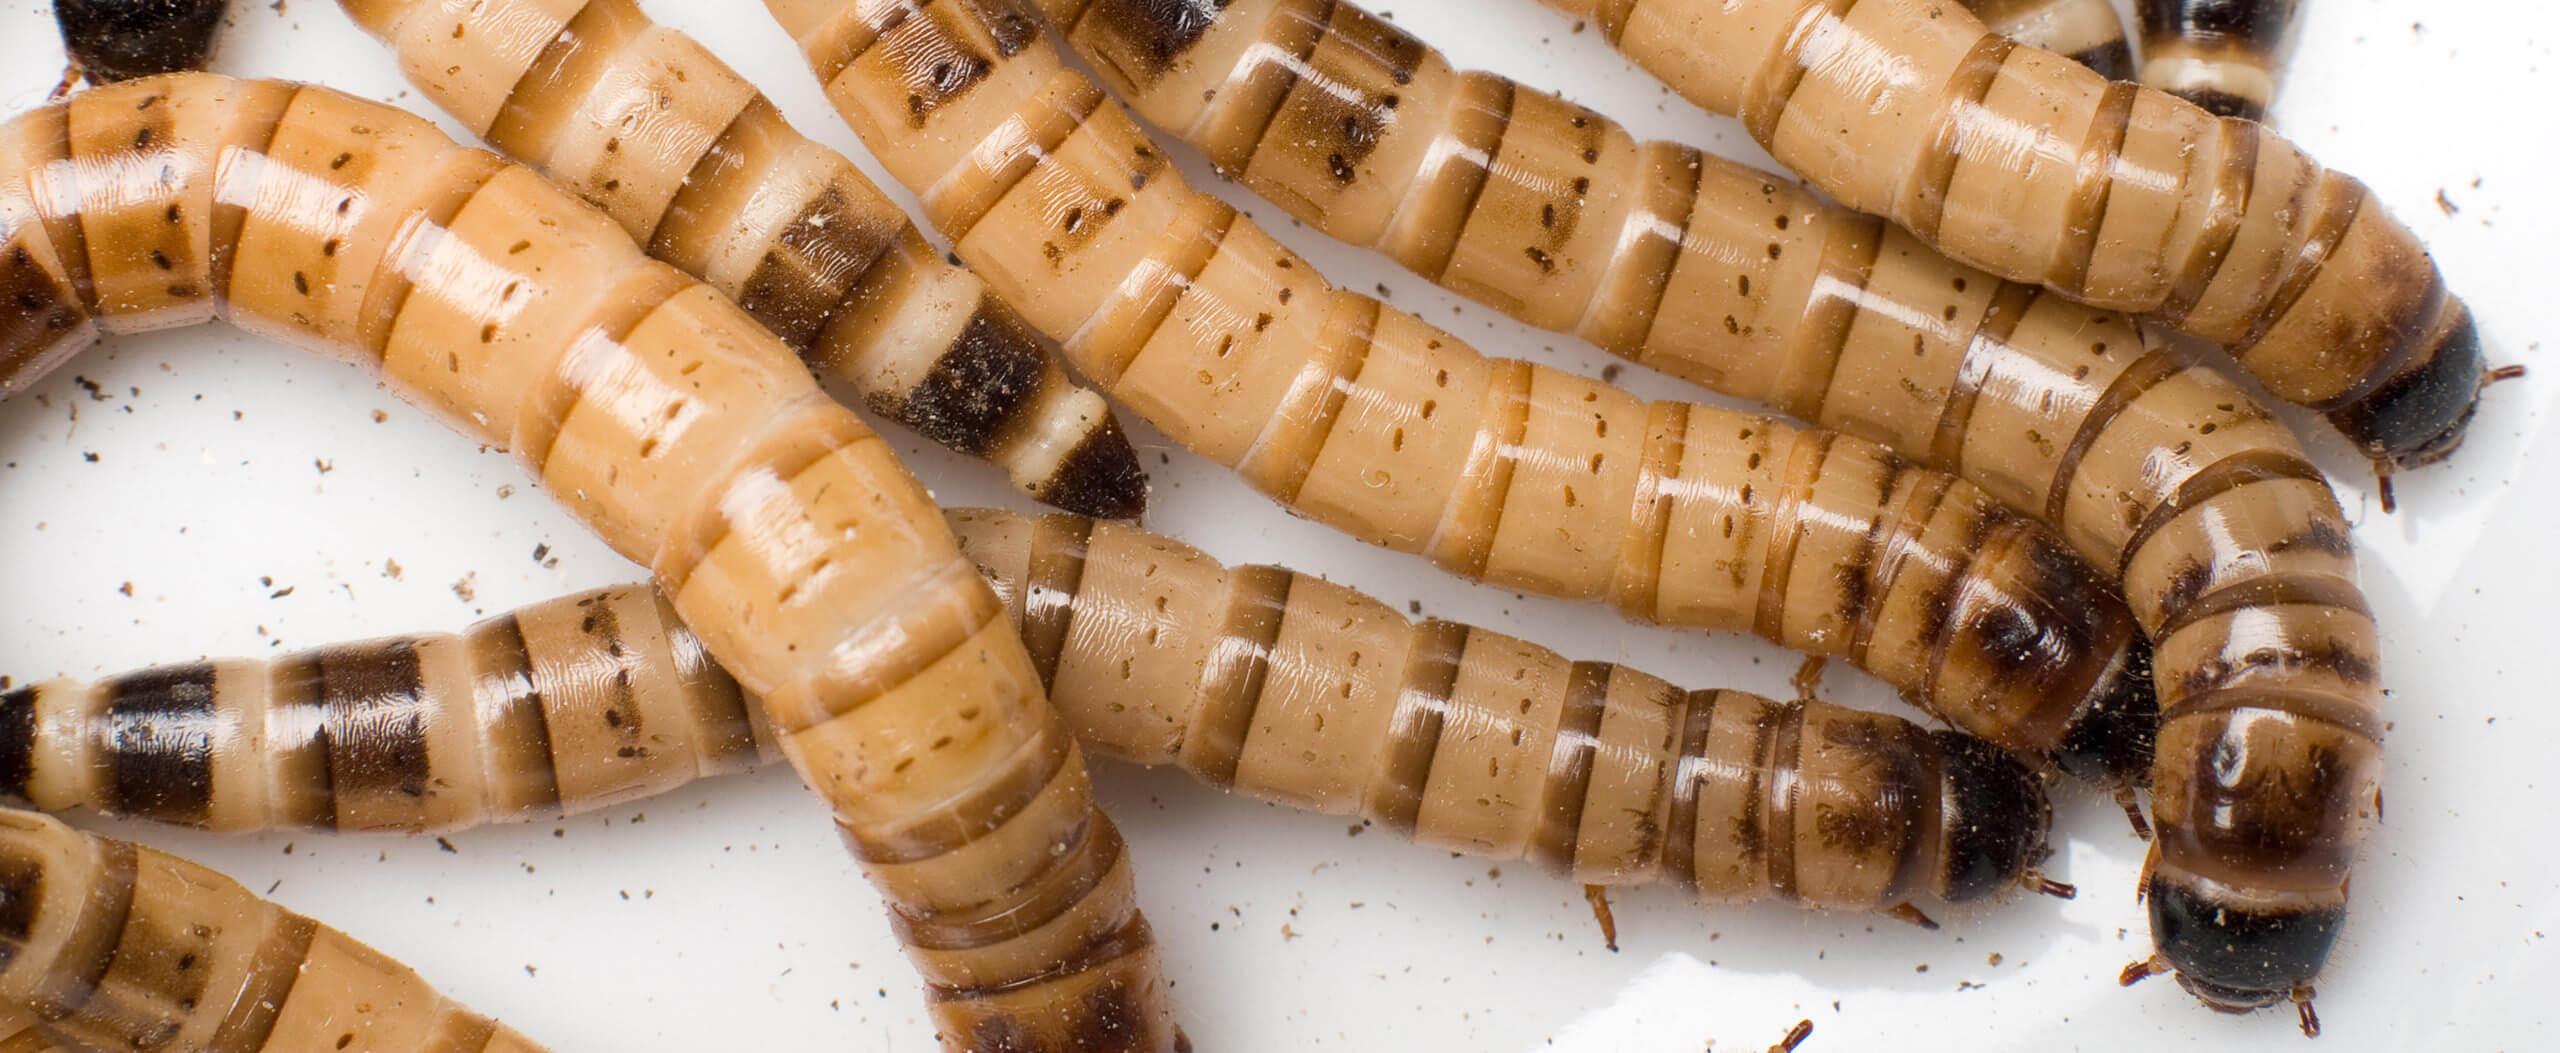 Würmer / Maden